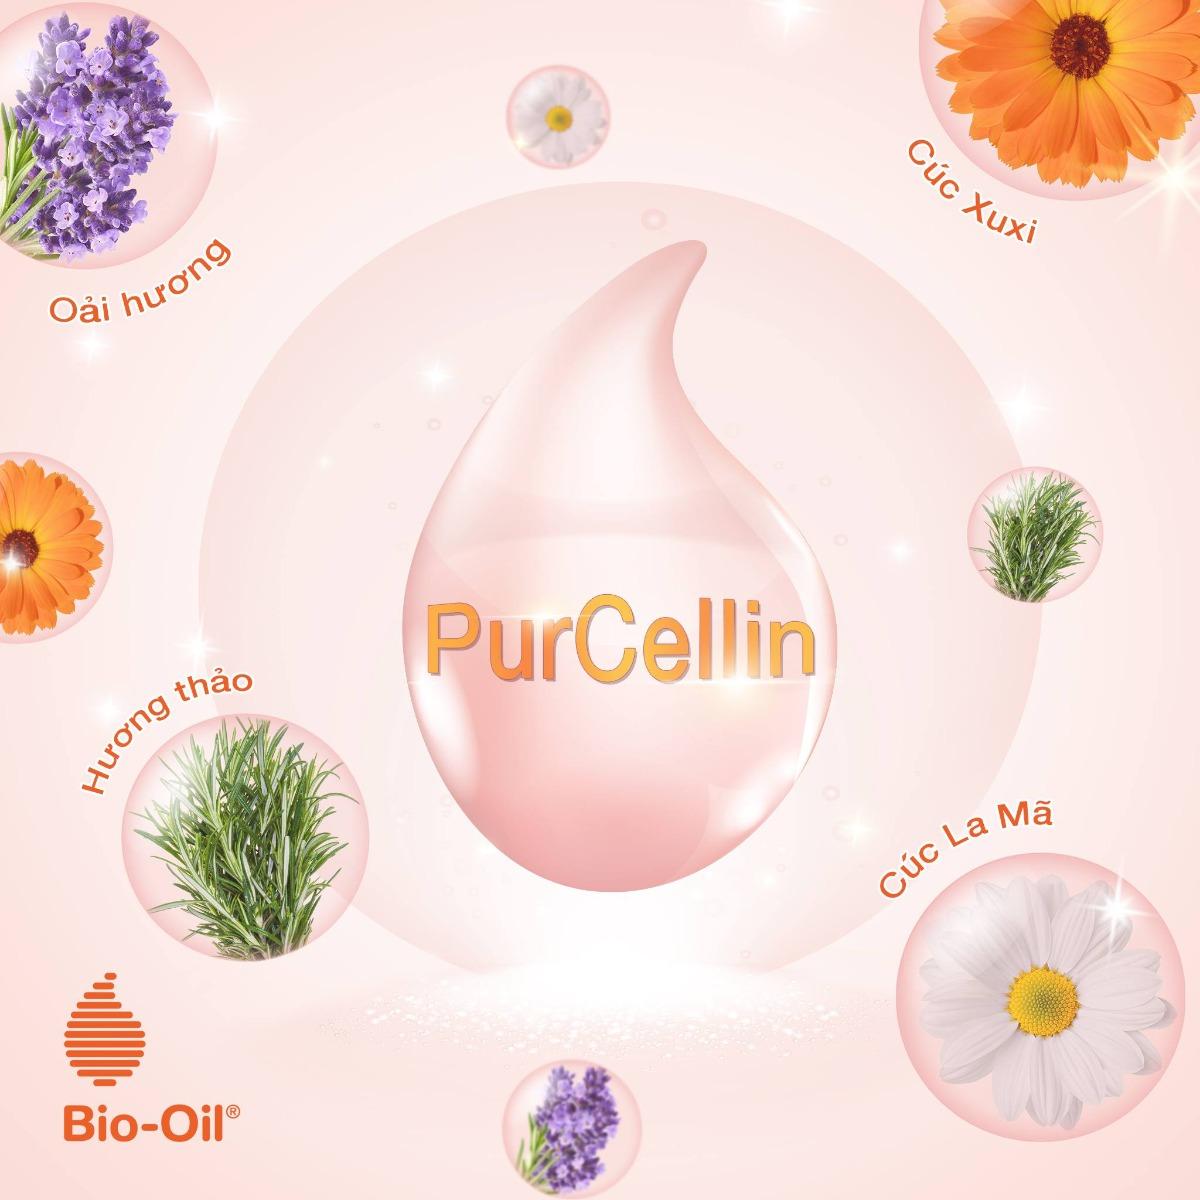 thanh phan bio oil